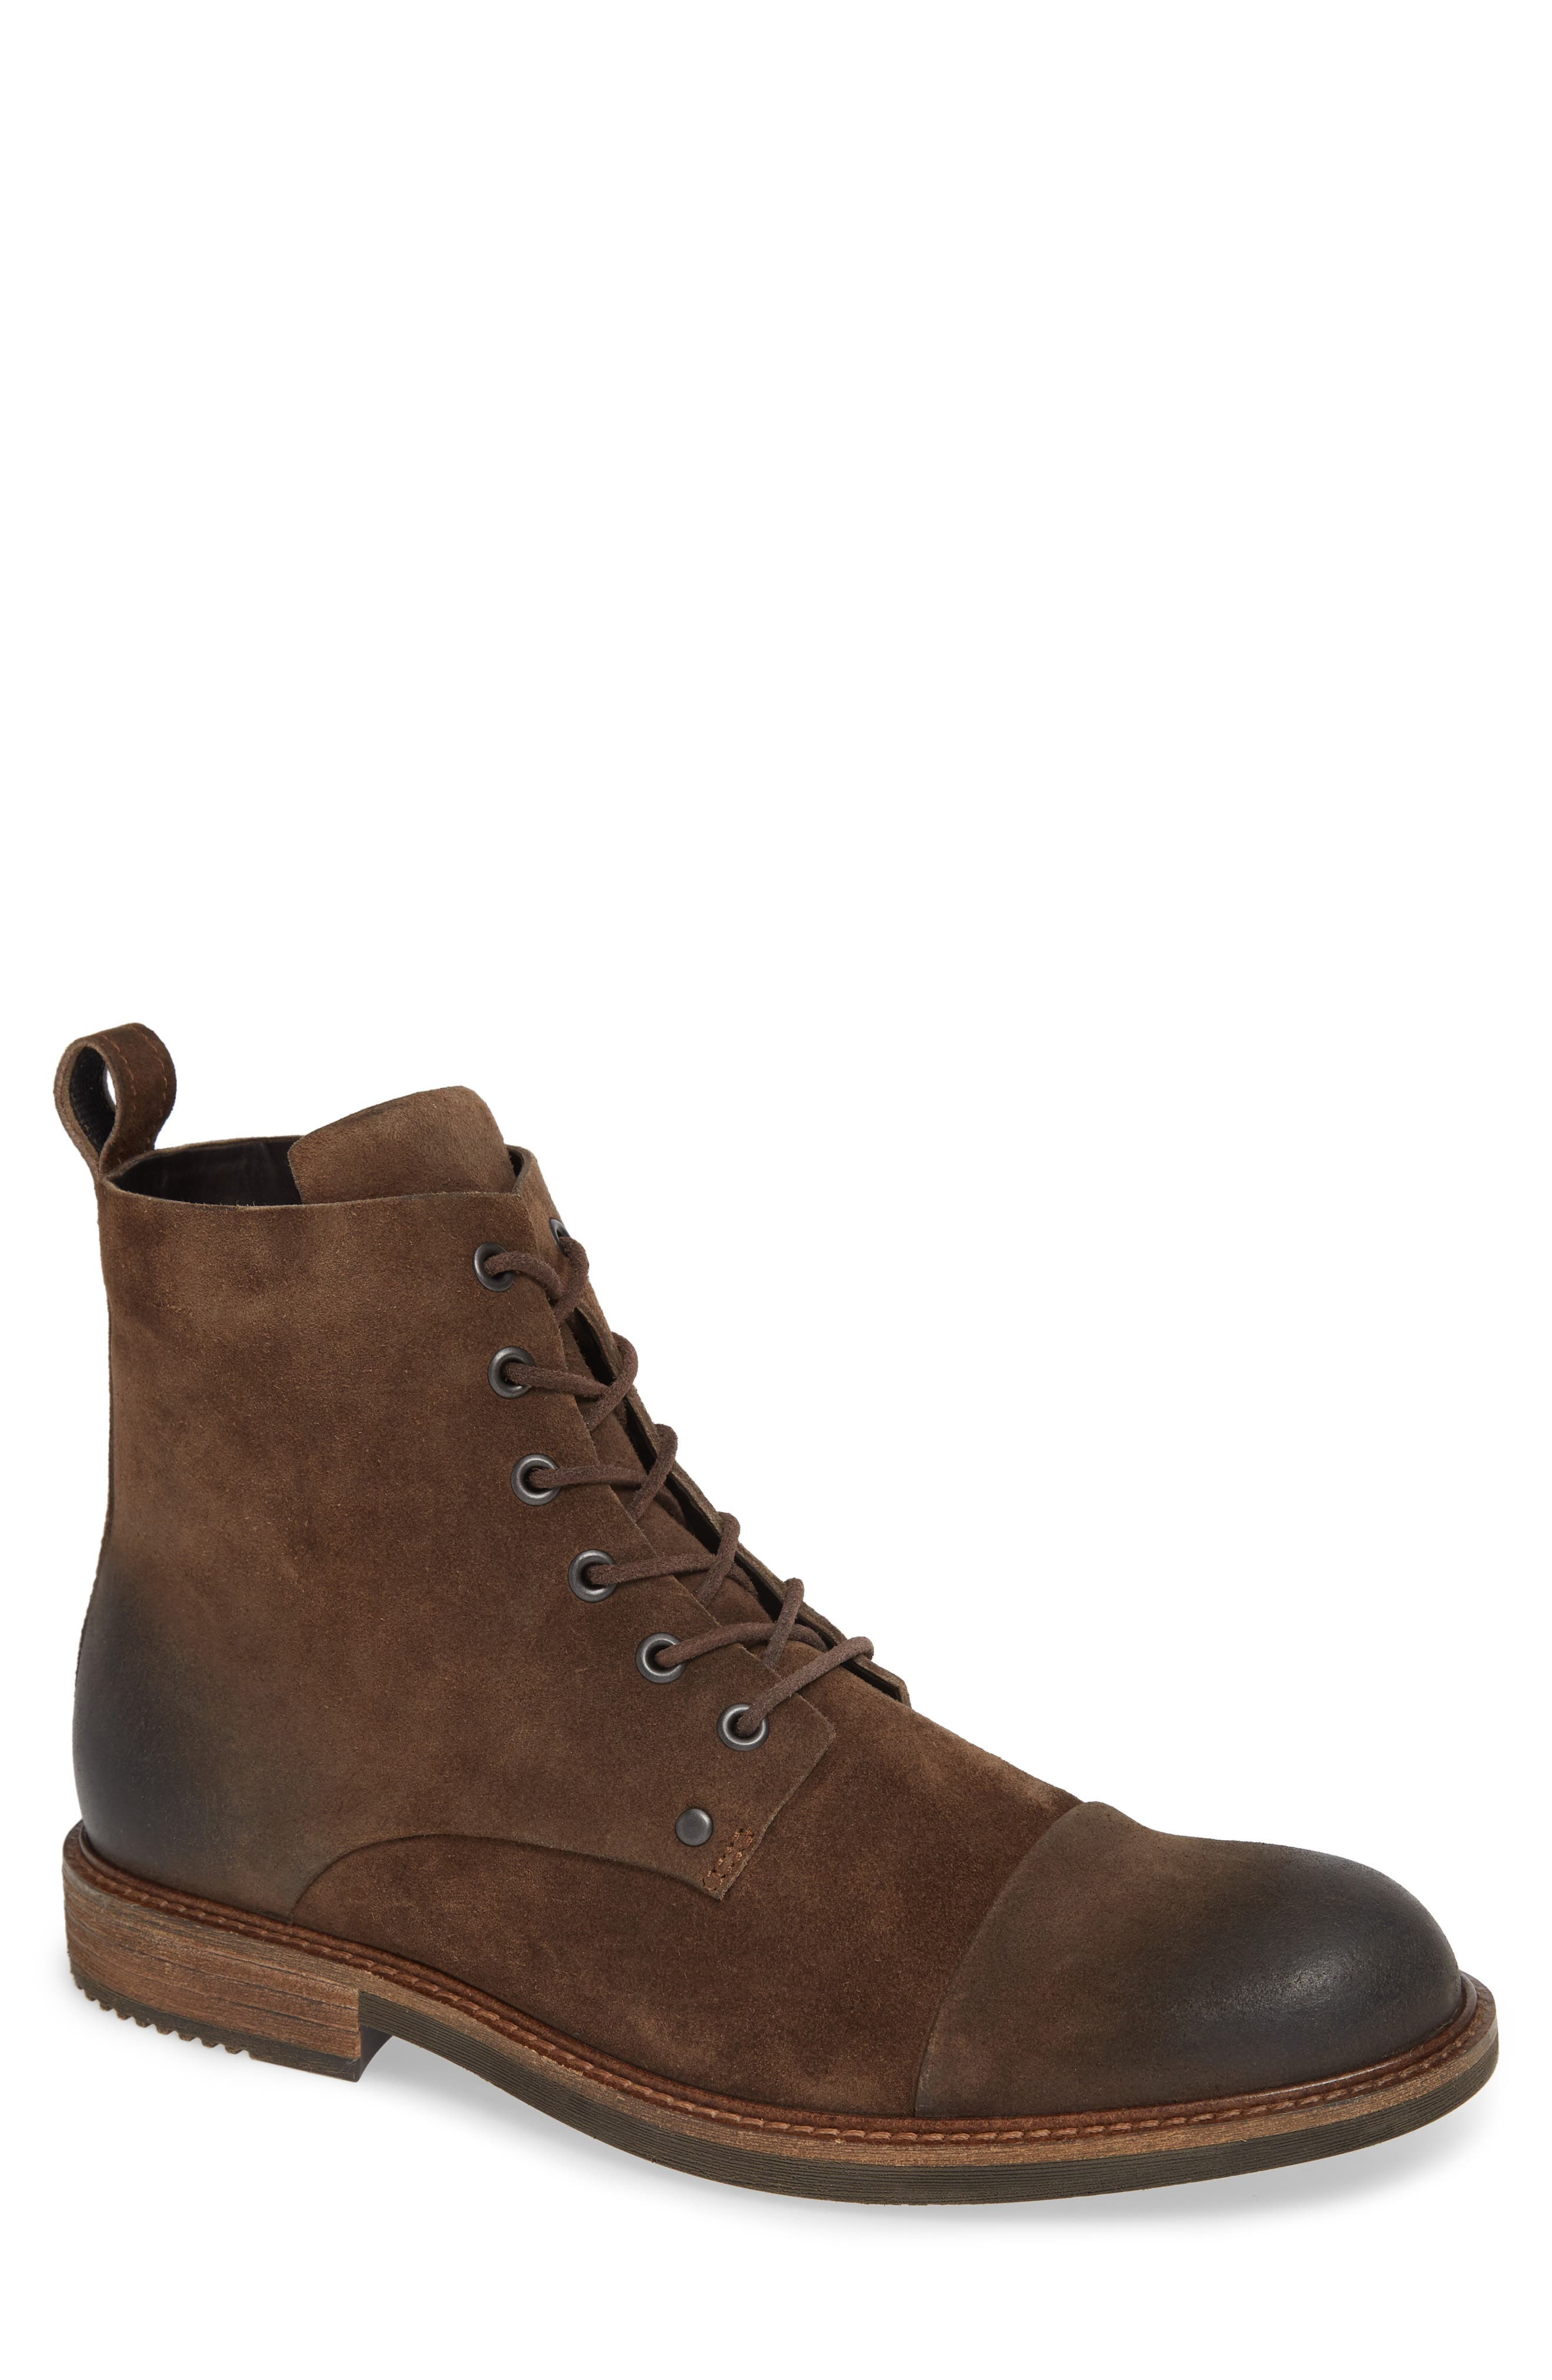 Ecco Kenton Artisan Cap Toe Boot - Brown